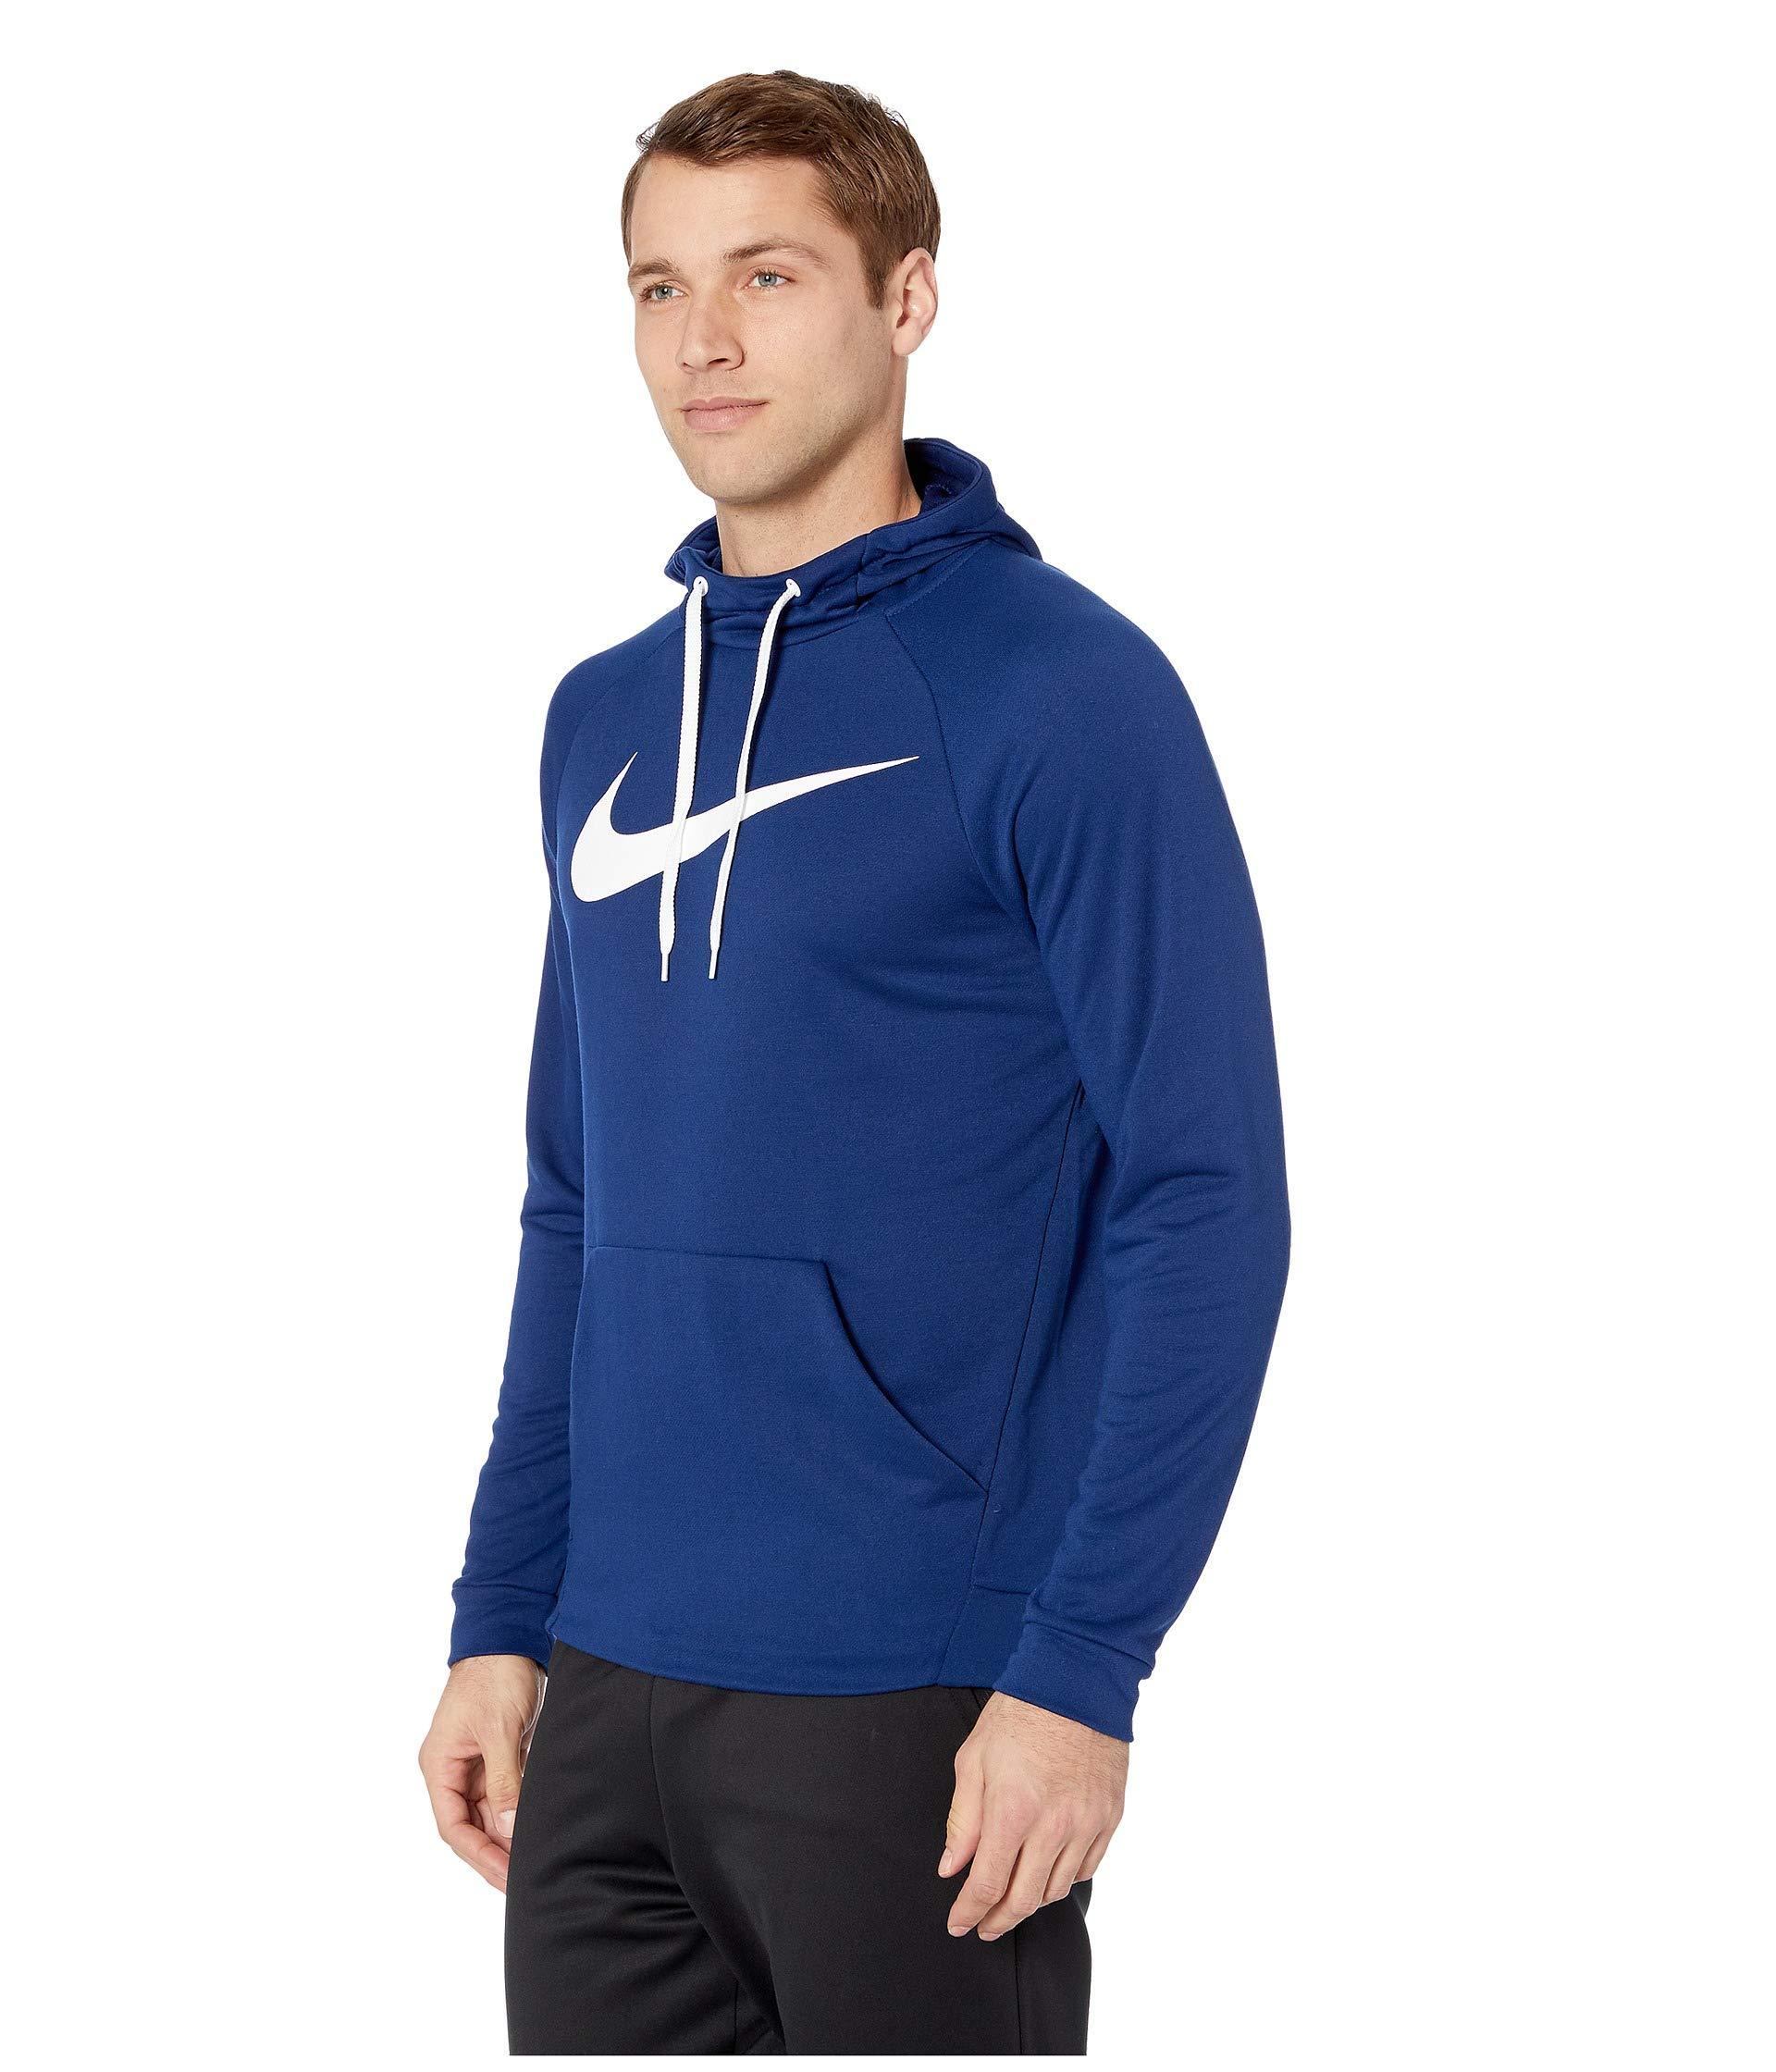 947ef643b301 Lyst - Nike Swoosh Pullover Dry Training Hoodie in Blue for Men